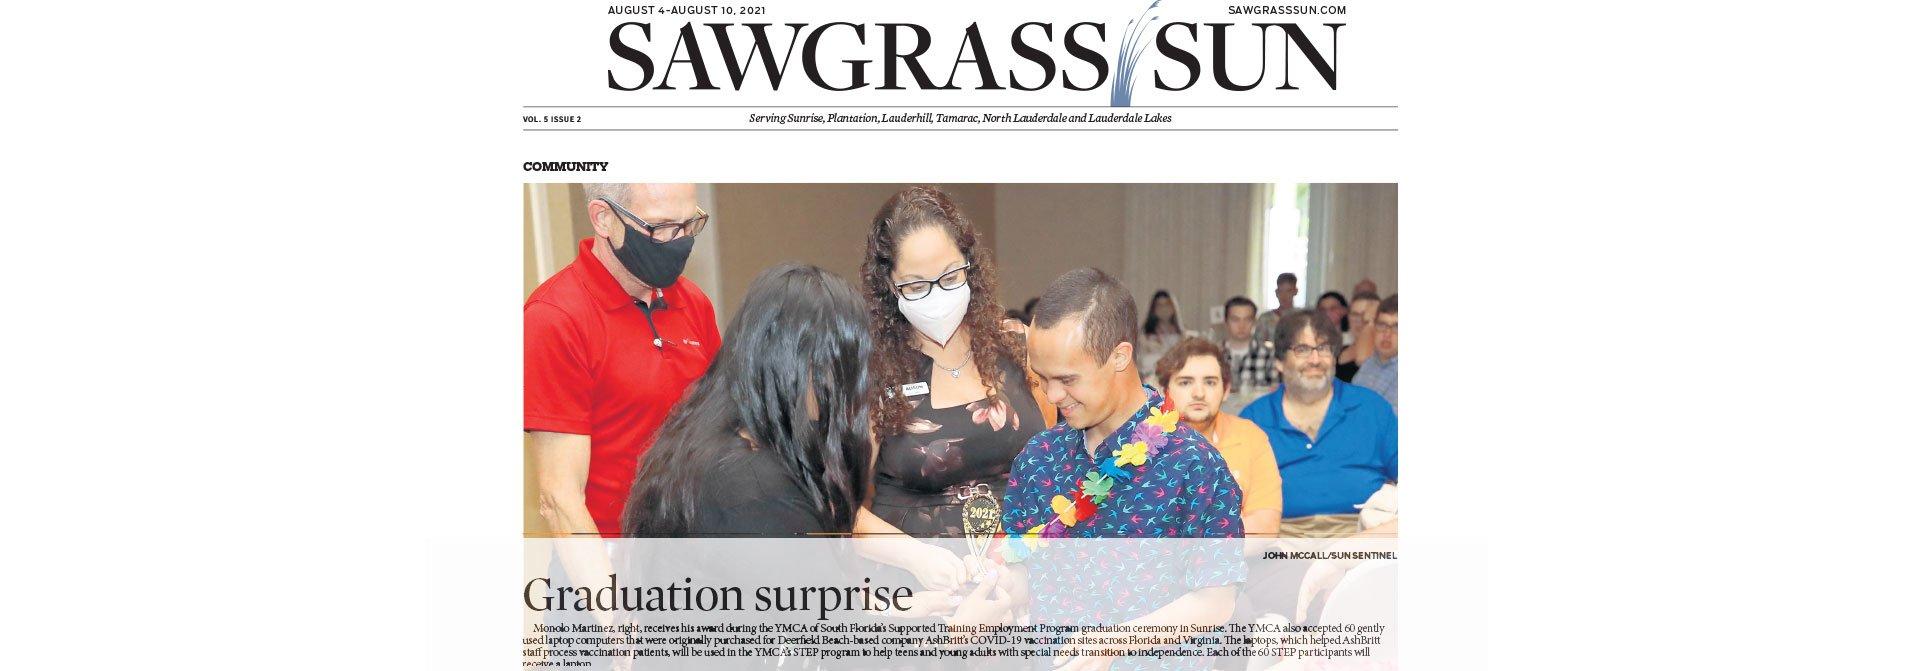 SAWGRASS SUN : Graduation Surprise  | AUGUST 4-AUGUST 10, 2021